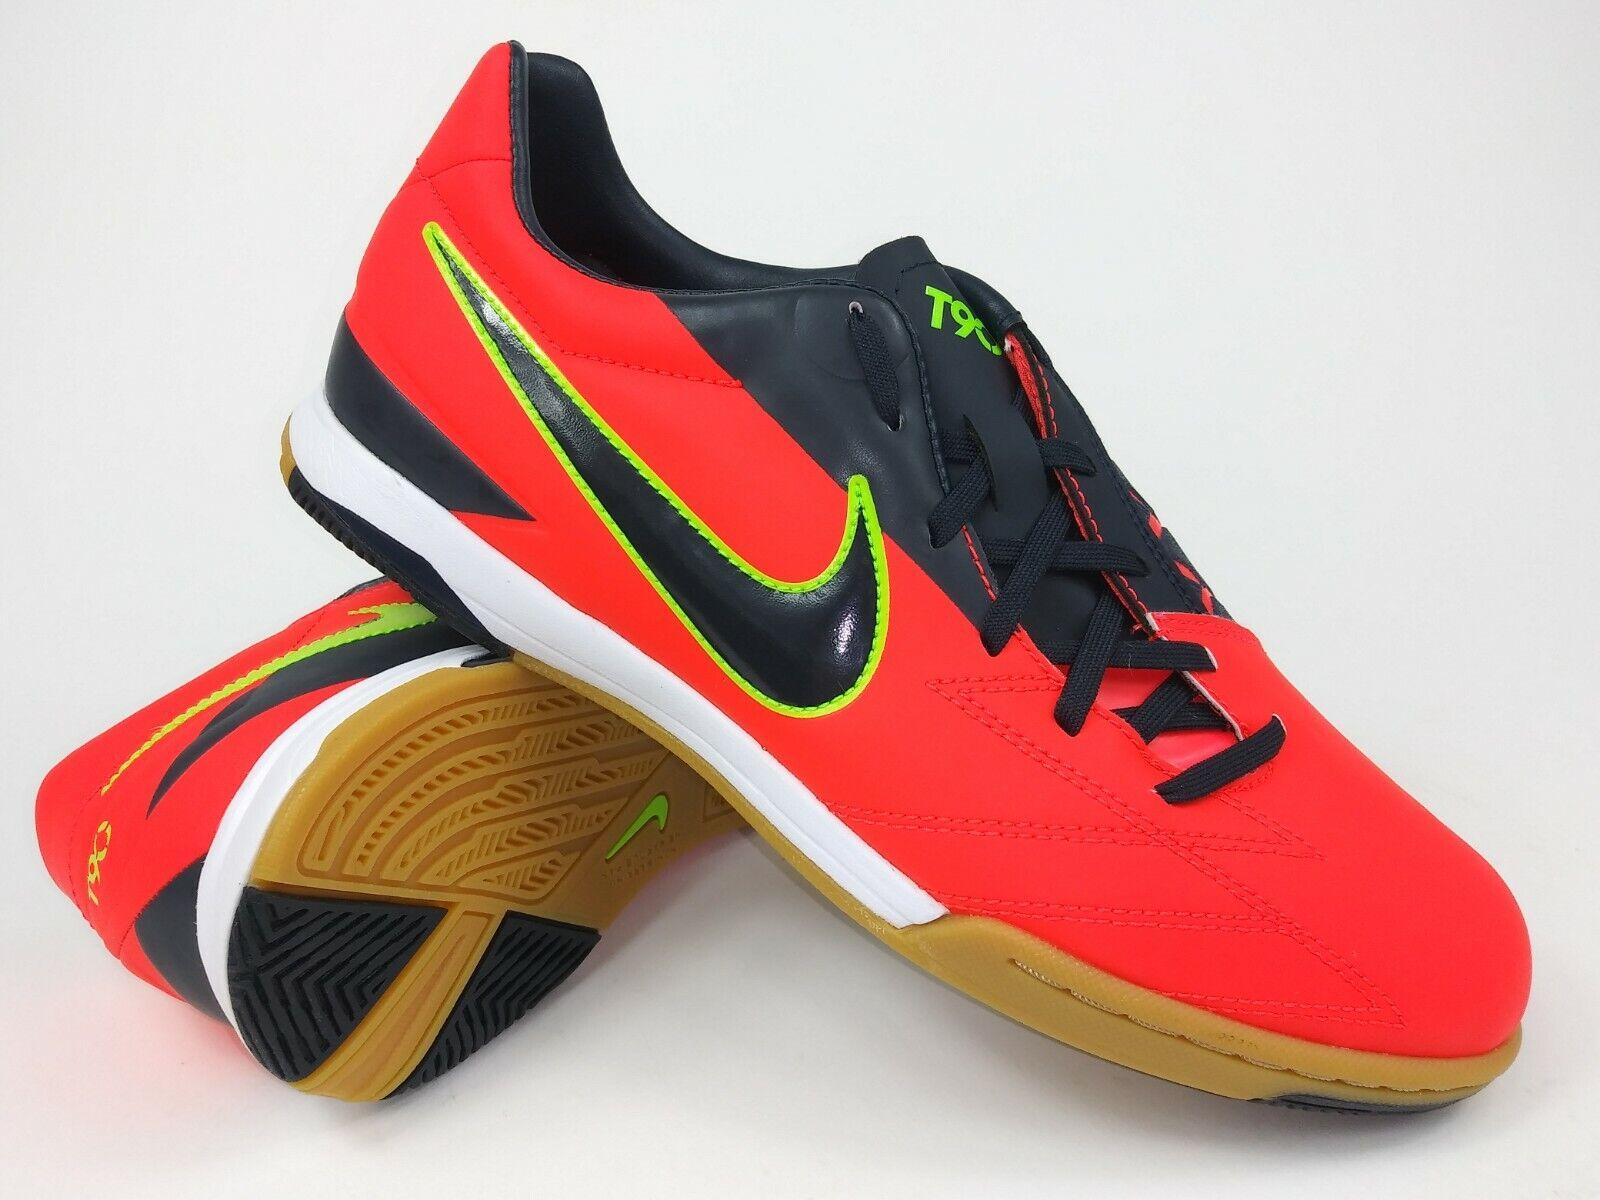 Nike Hombre Raro T90 Shoot IV IC 472558-643 Naranja Zapatos Botines de Fútbol Indoor